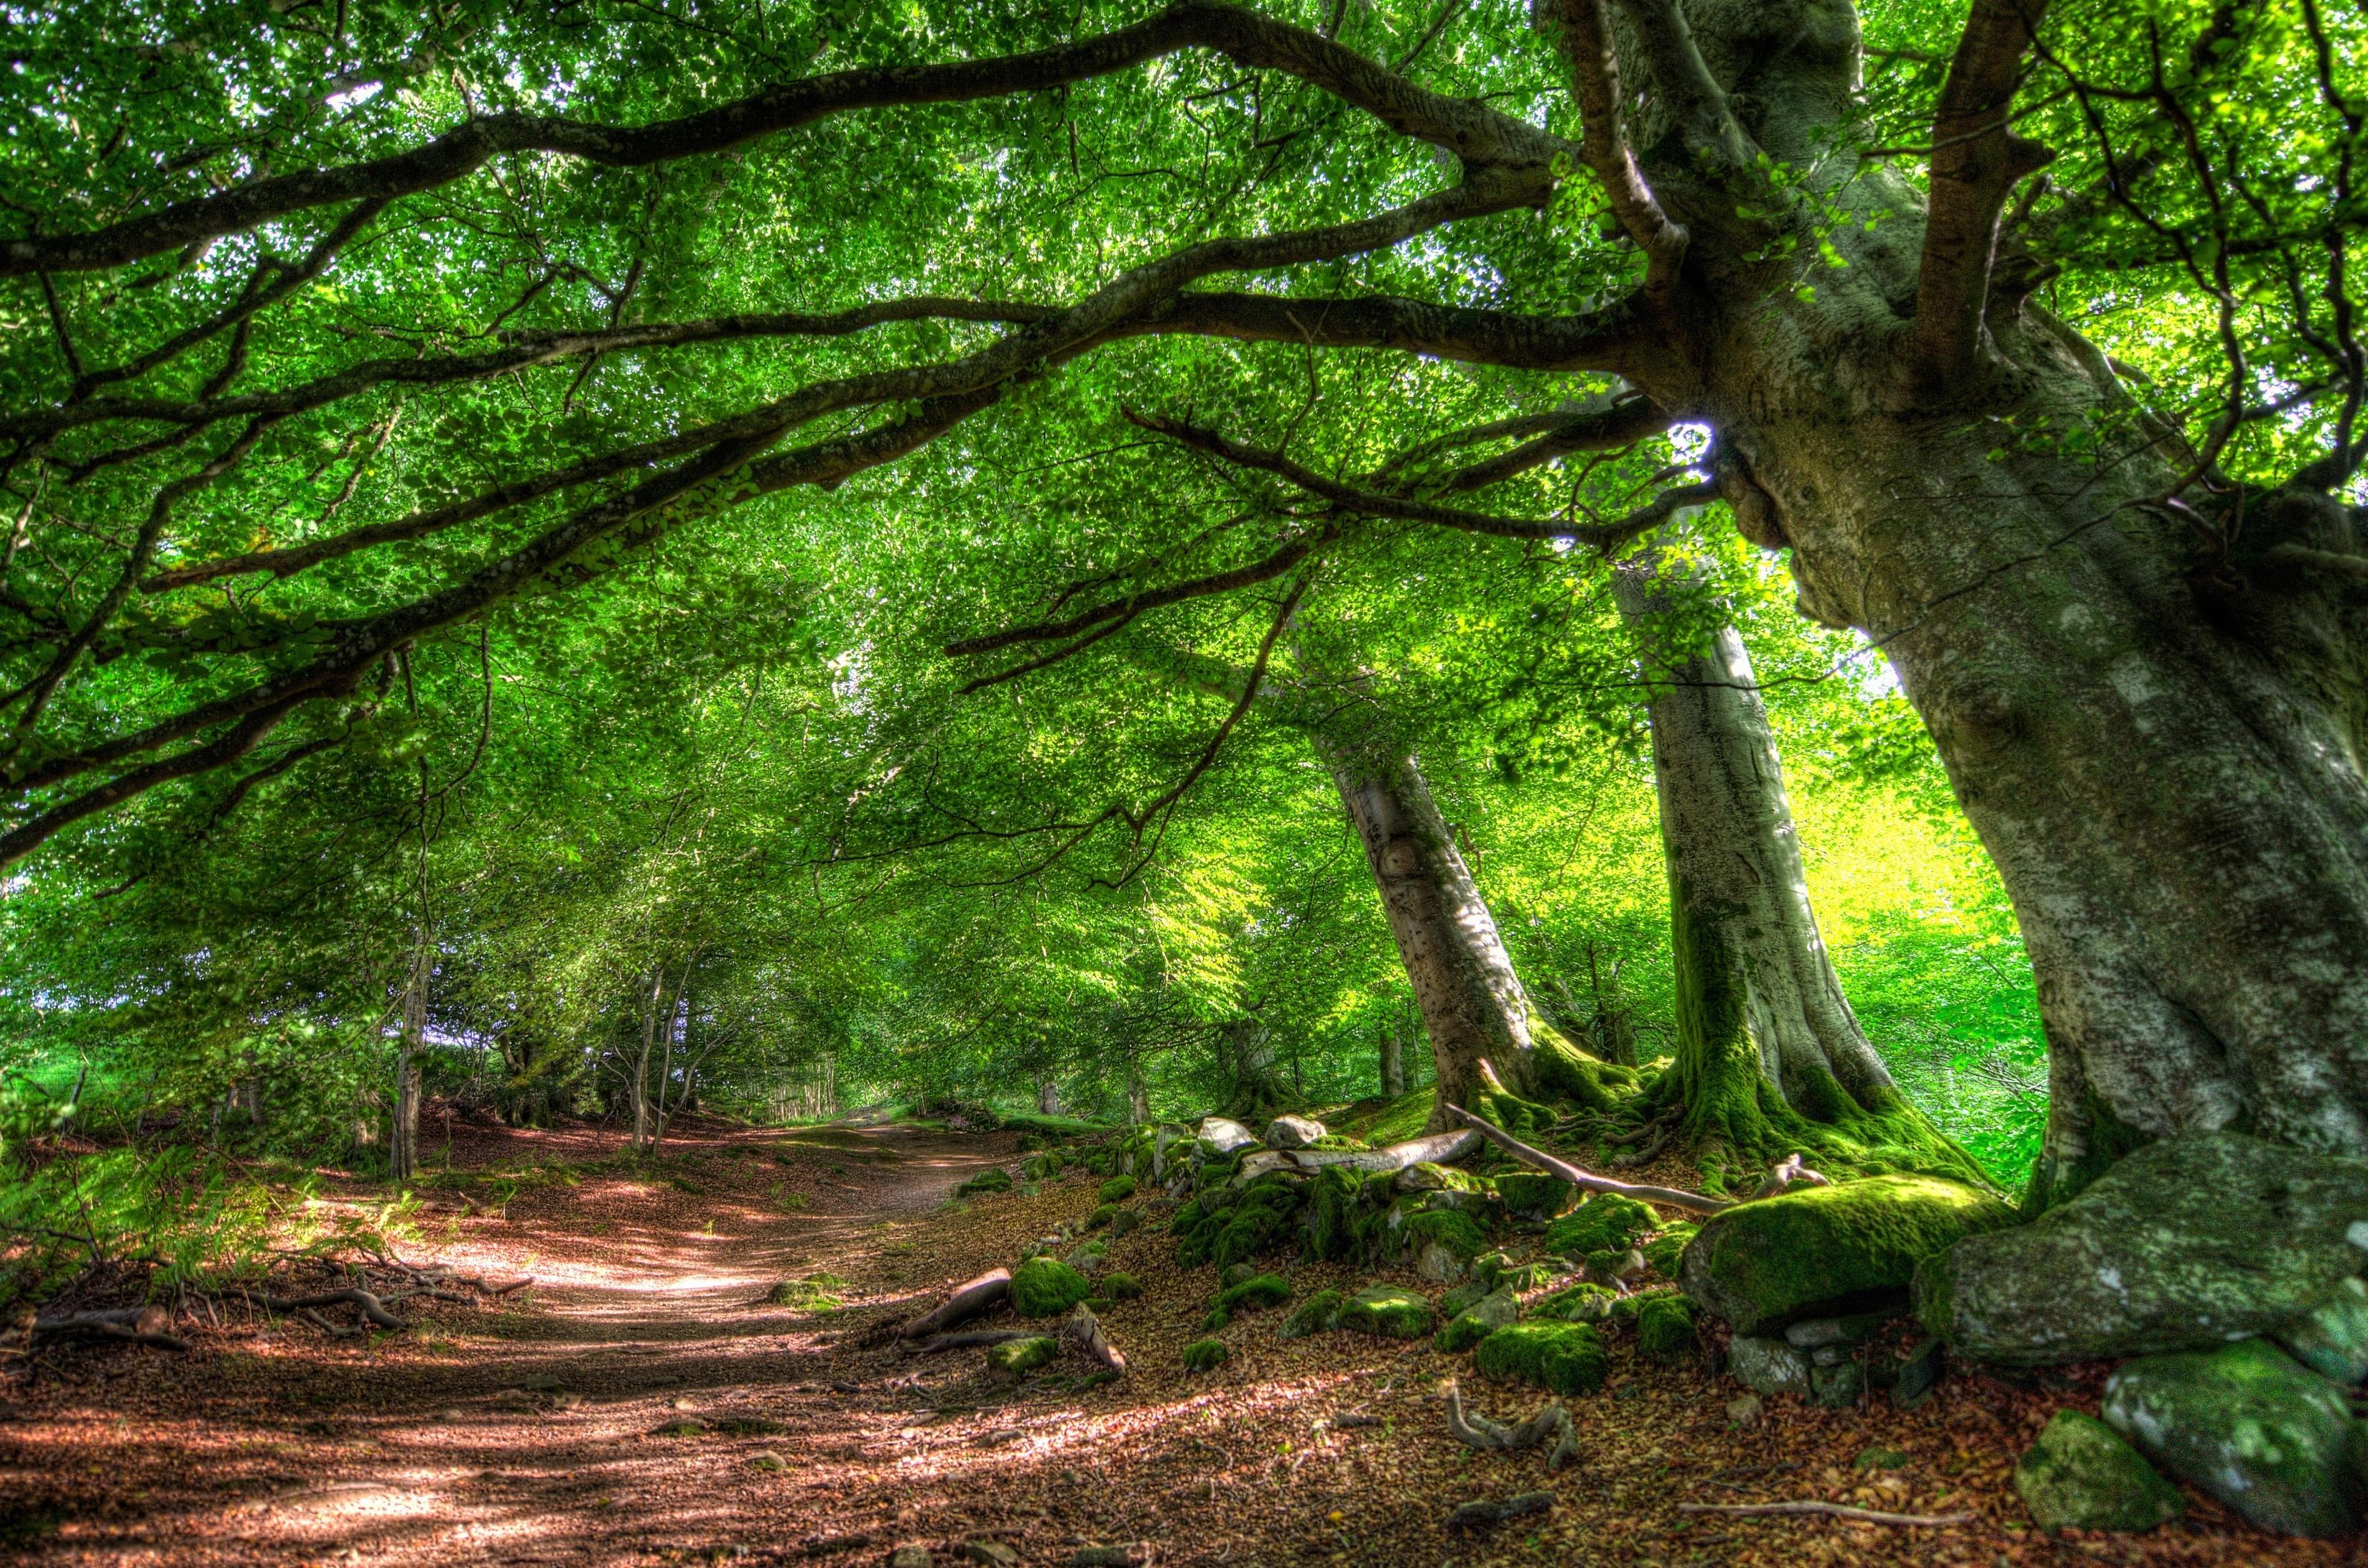 Картинки природы лес качестве